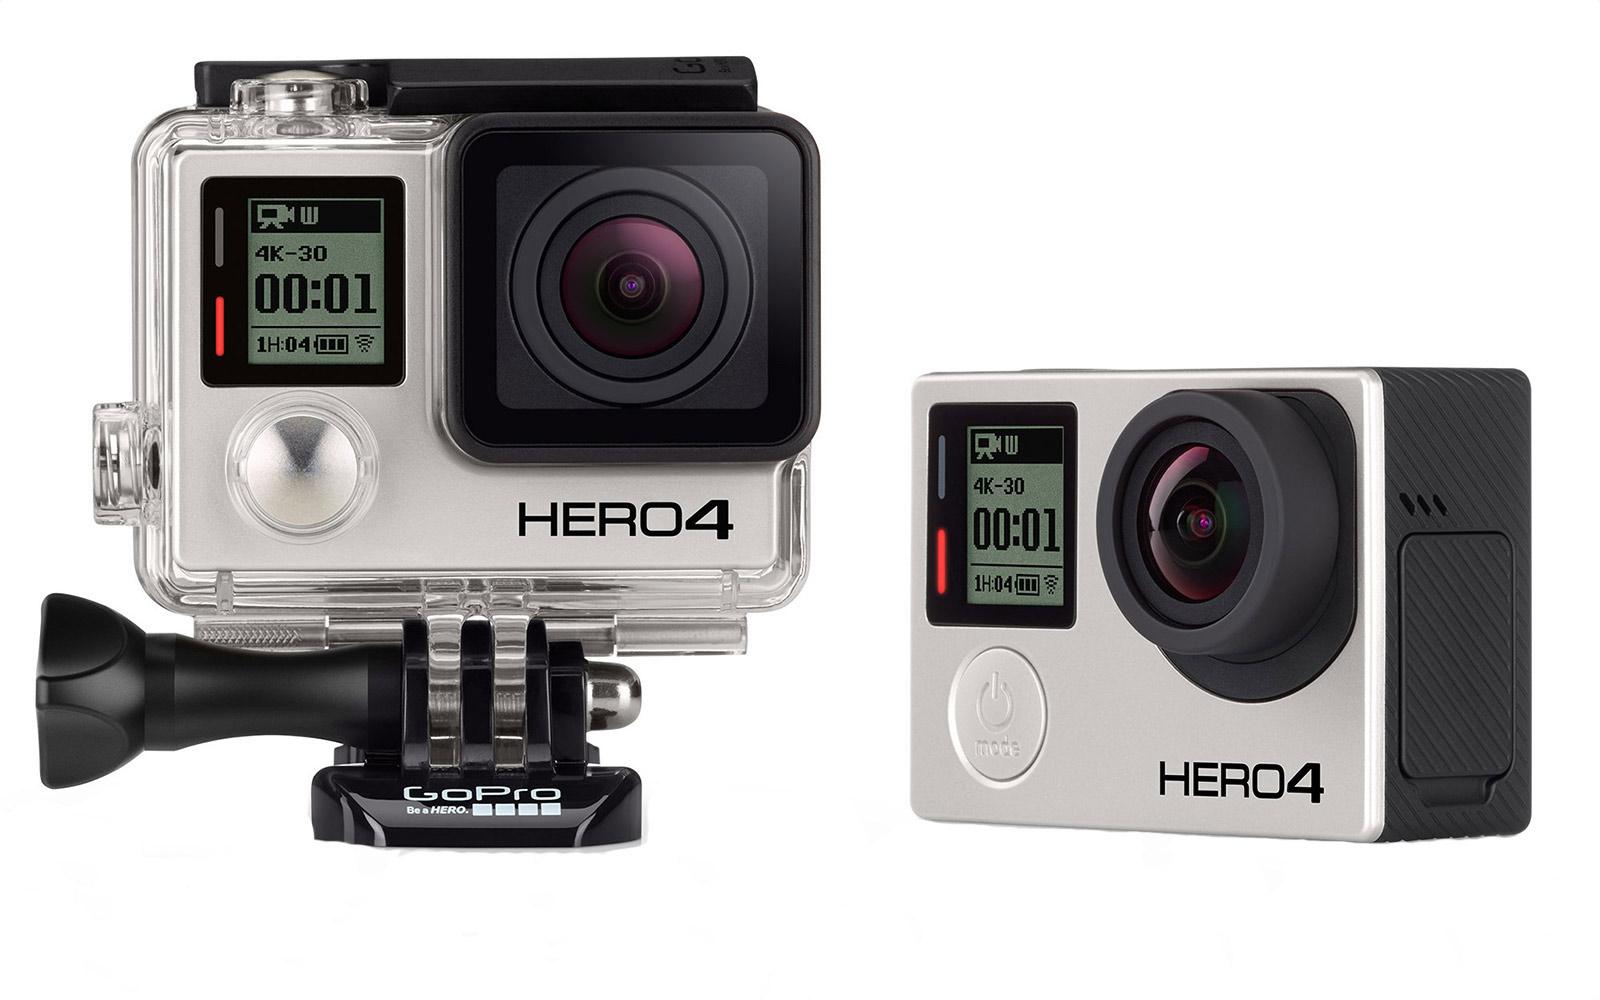 vwvortex-gift-guide-GoPro-Hero4-camera